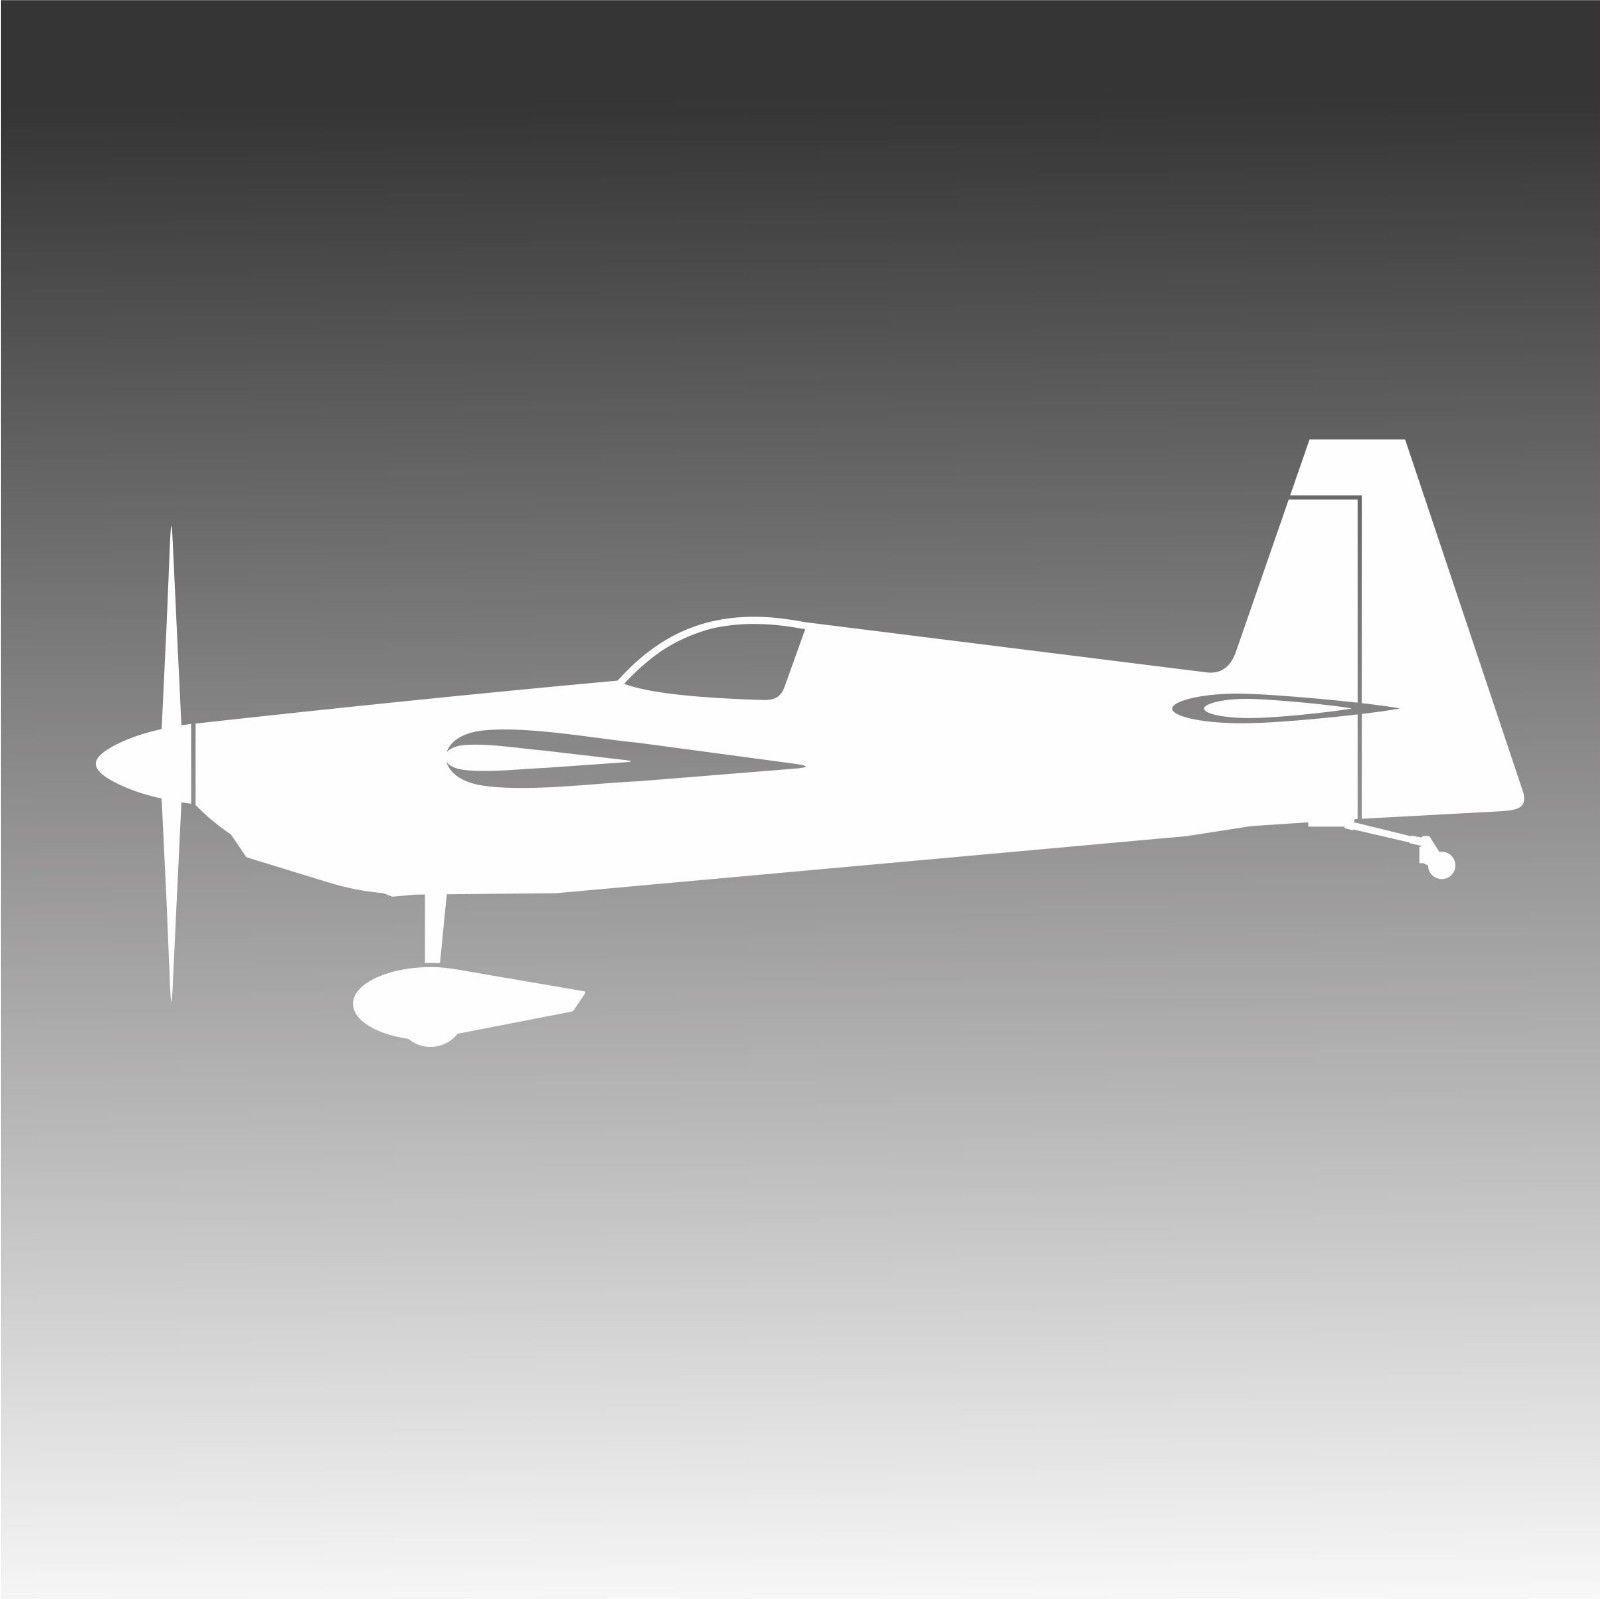 5 Edge 540 Profile Aircraft Decal Aerobatic Racing Airplane Pilot Crew Sticker Ebay Collectibles Airplane Pilot Aircraft Pilot [ 1599 x 1600 Pixel ]